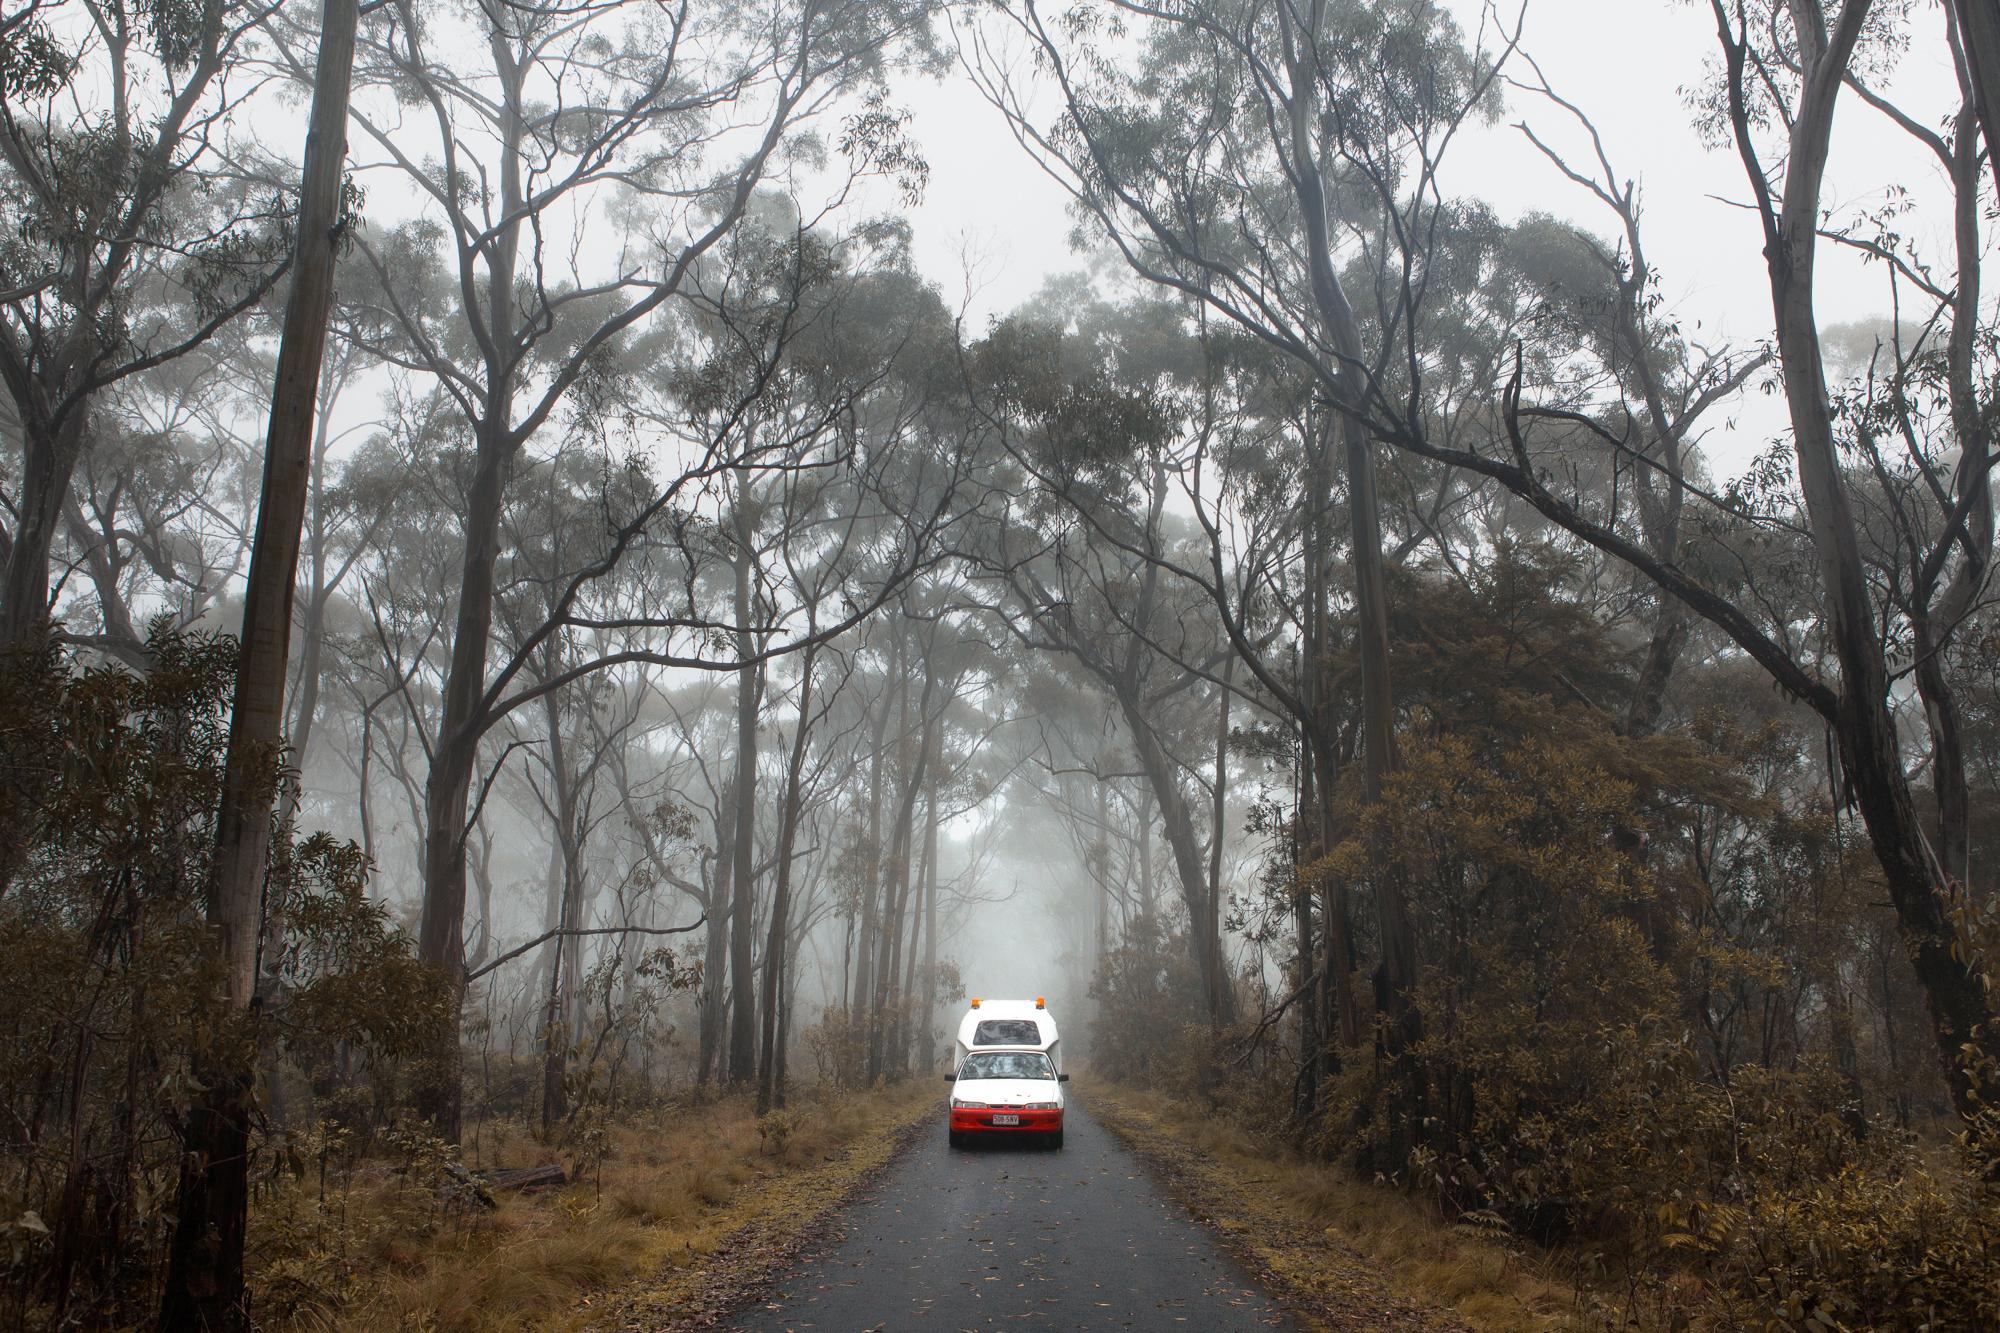 44-Bec_Kilpatrick_Photography_AustraliaIMG_4716